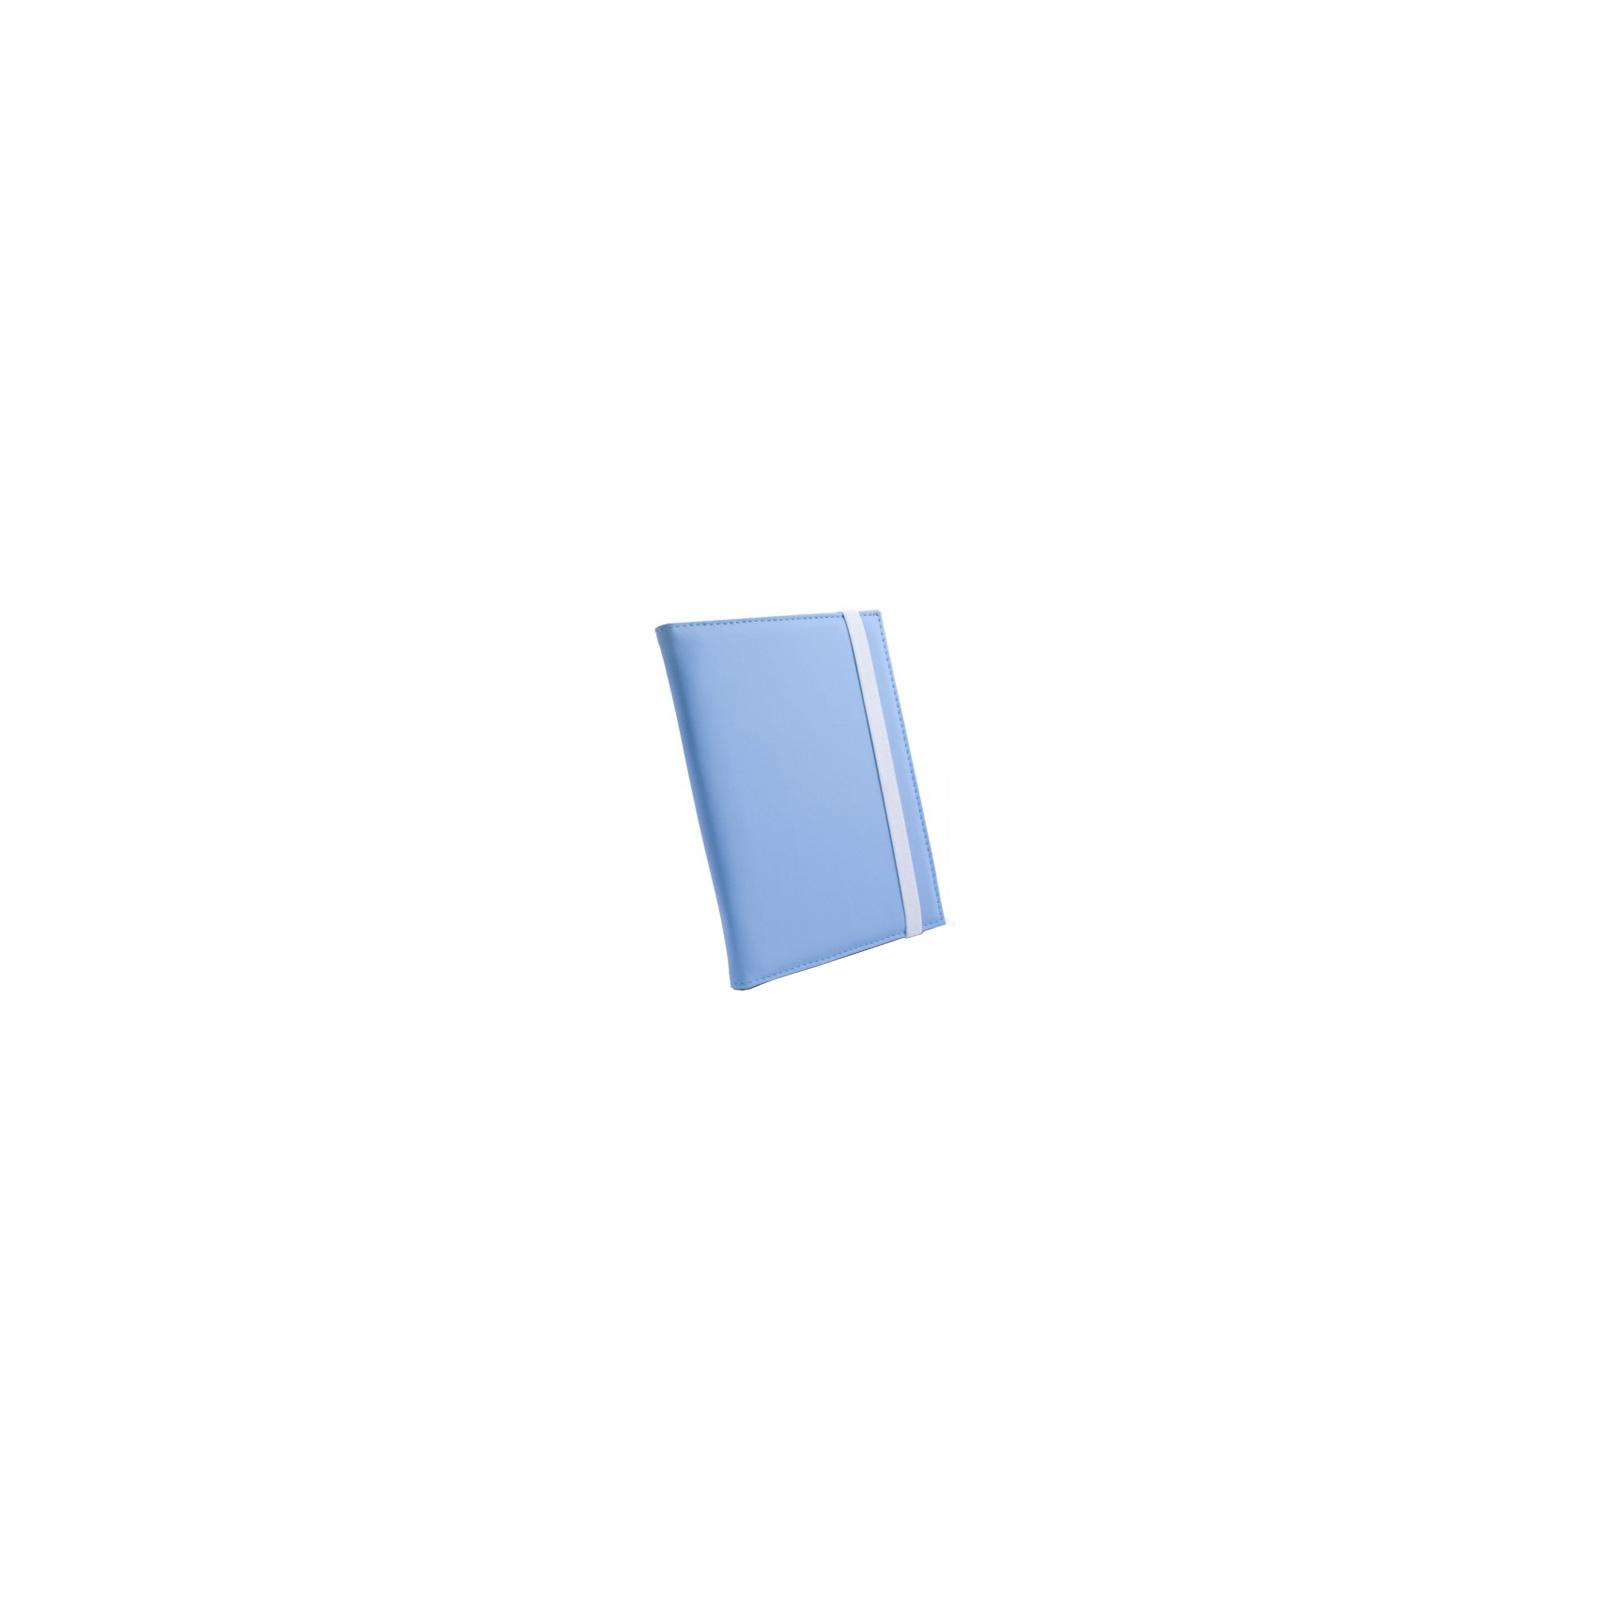 Чехол для электронной книги Tuff-Luv 6 Slim Book Light Blue (A7_23)